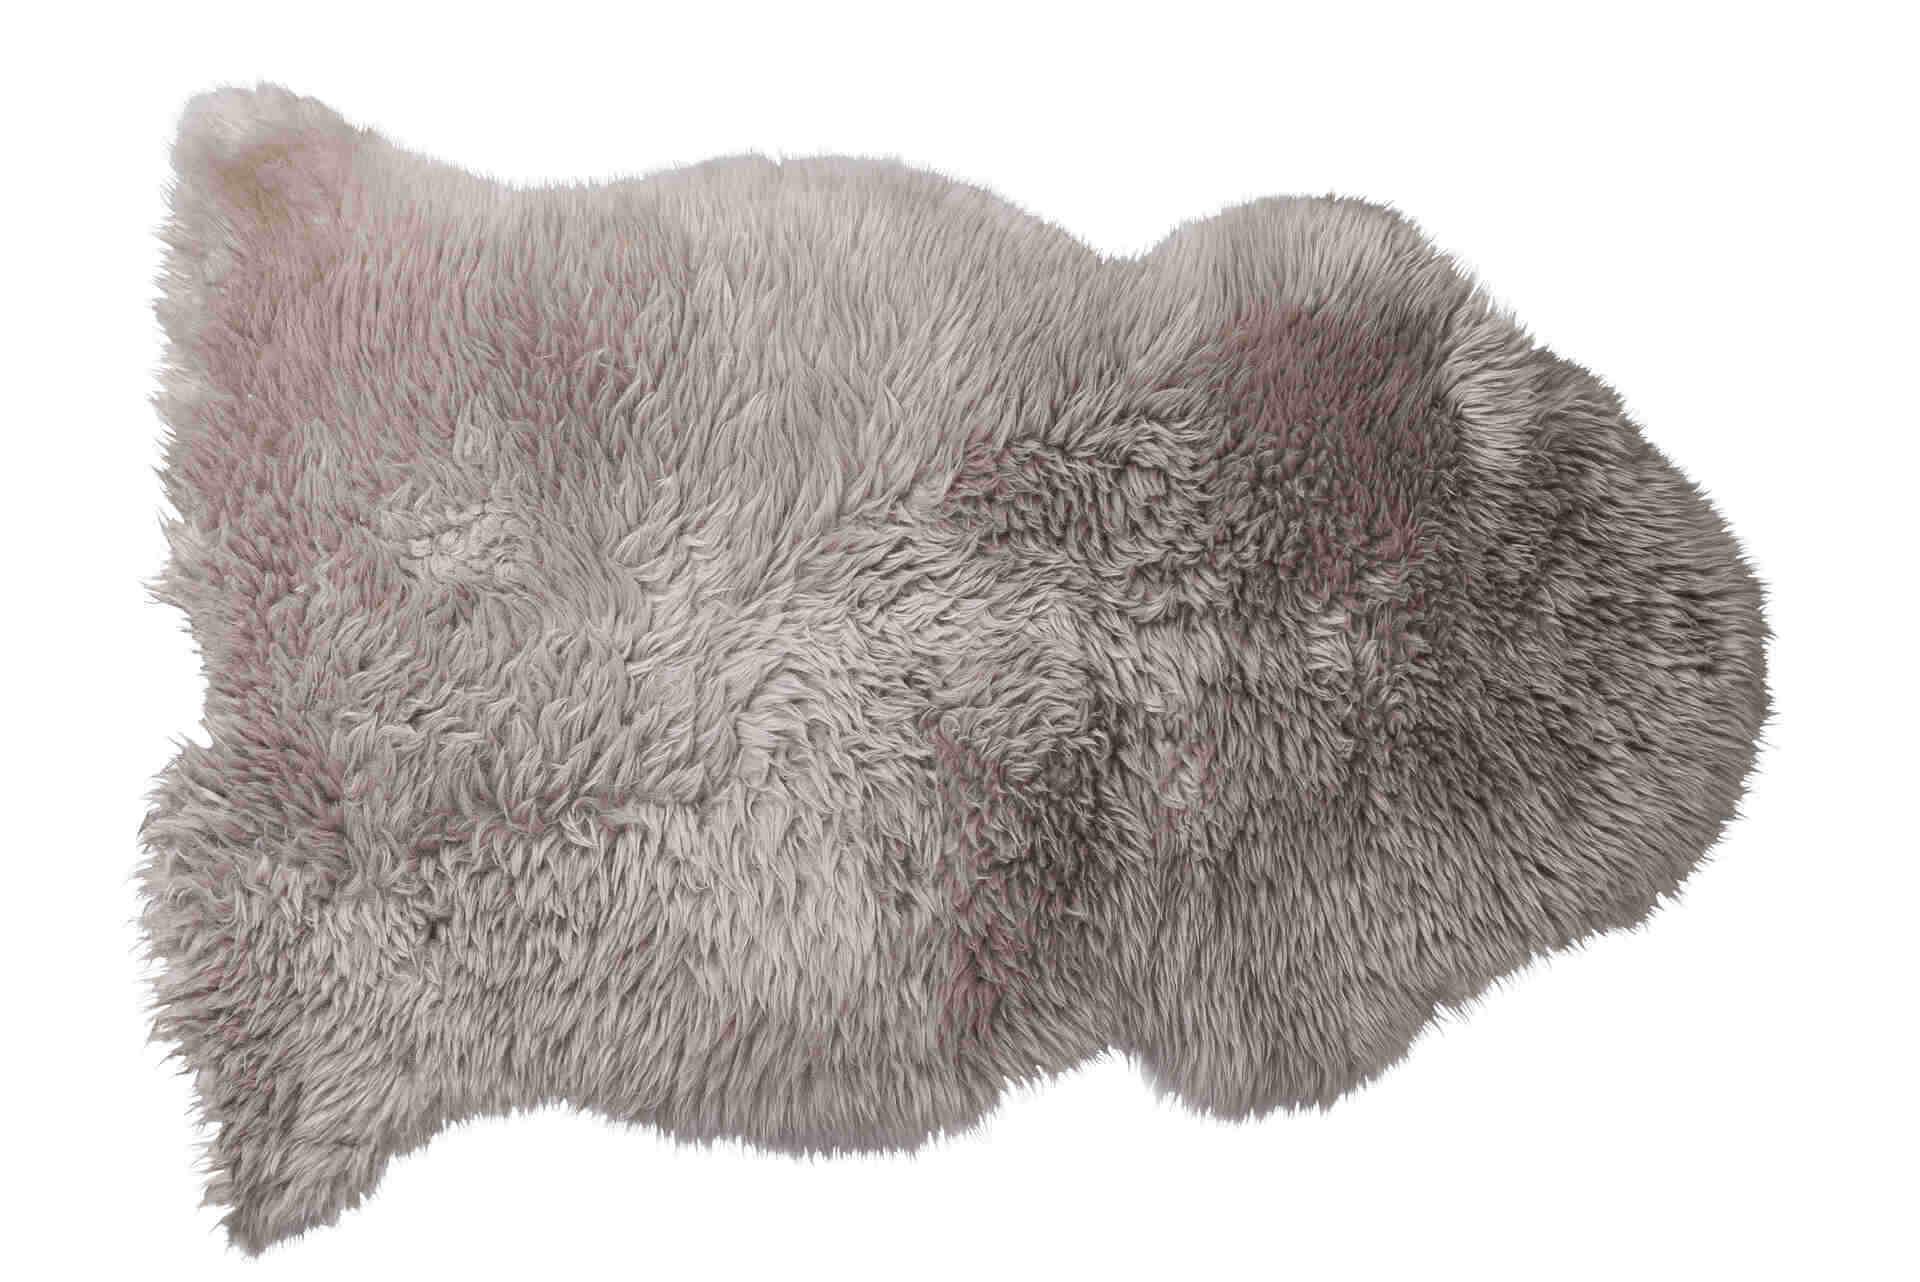 Snugg Fellhof lampaantalja Deko harmaa